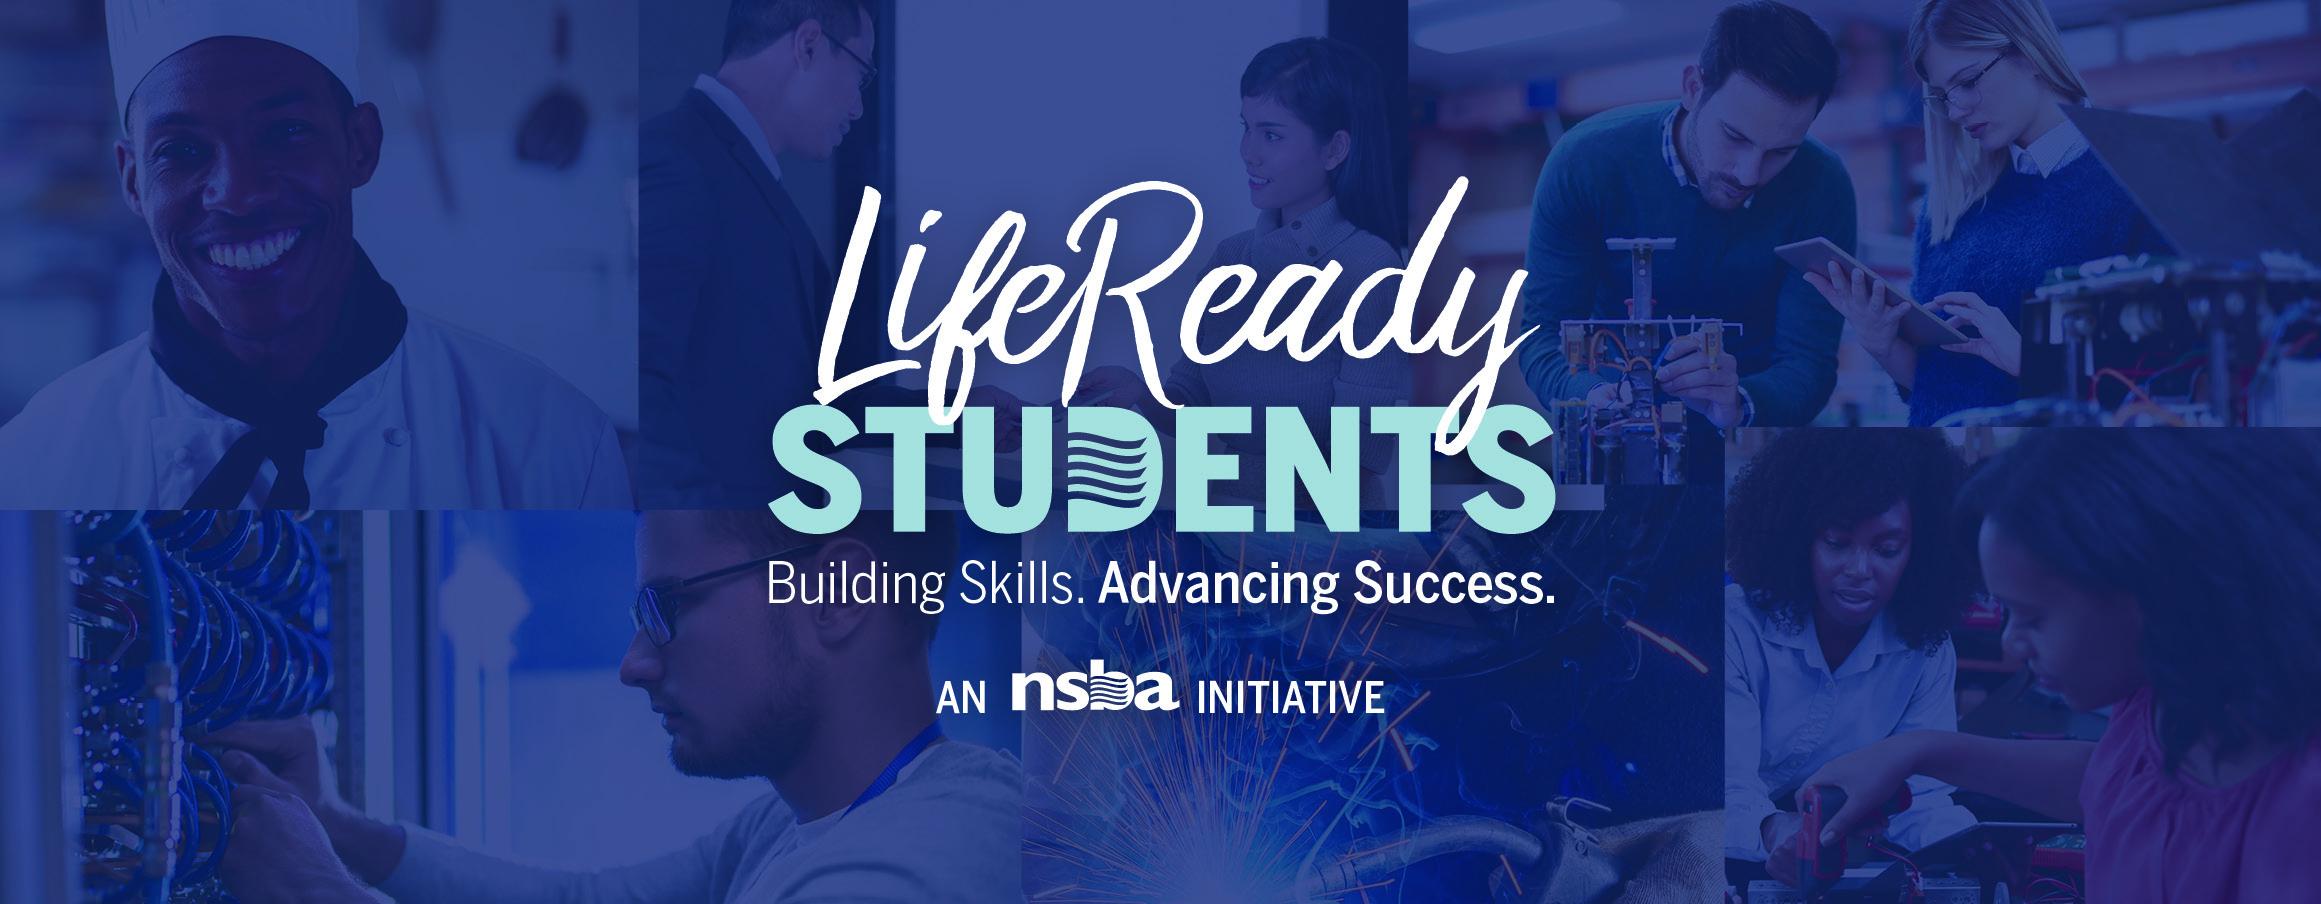 LifeReady Students | National School Boards Association